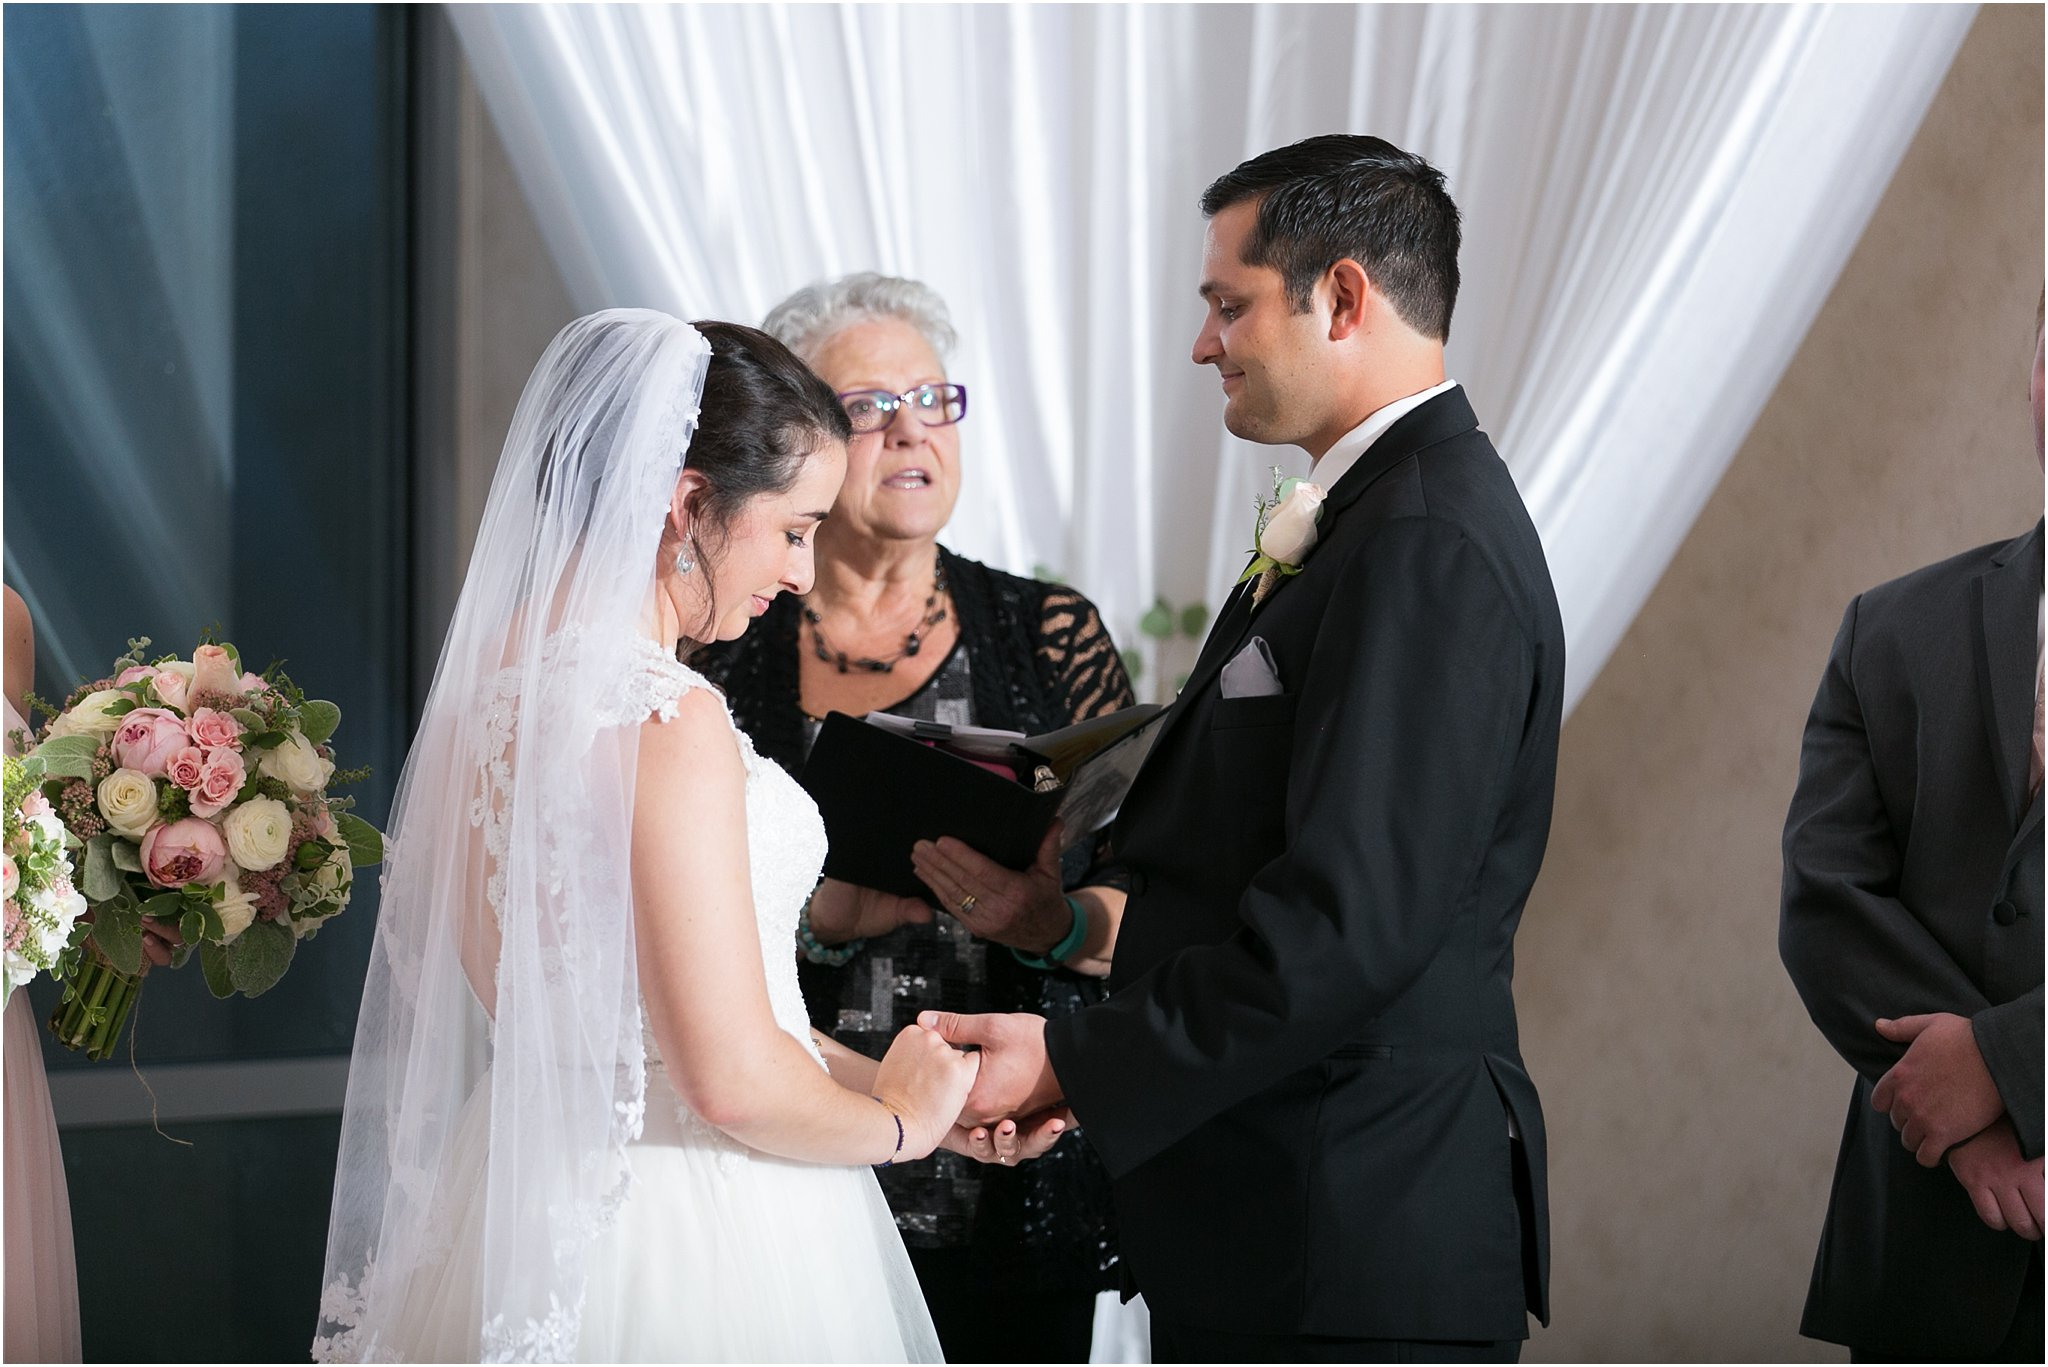 jessica_ryan_photography_virginia_wedding_photographer_wedding_hurricane_norfolk_botanical_gardens_hurricane_matthew_wedding_3590